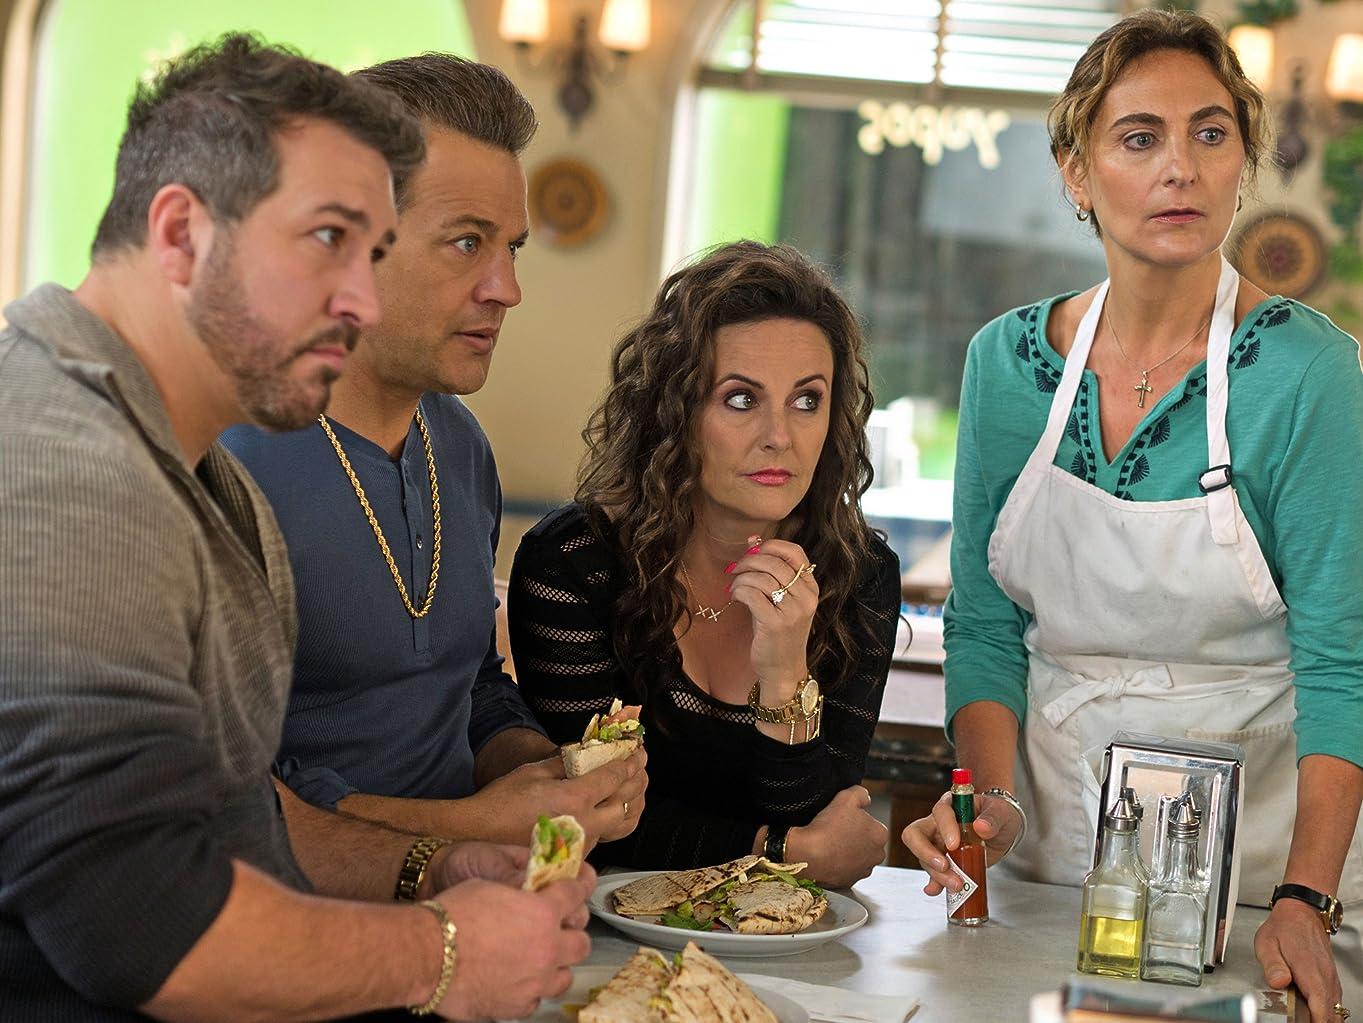 Universal Pictures' My Big Fat Greek Wedding 2 - Trailer 2